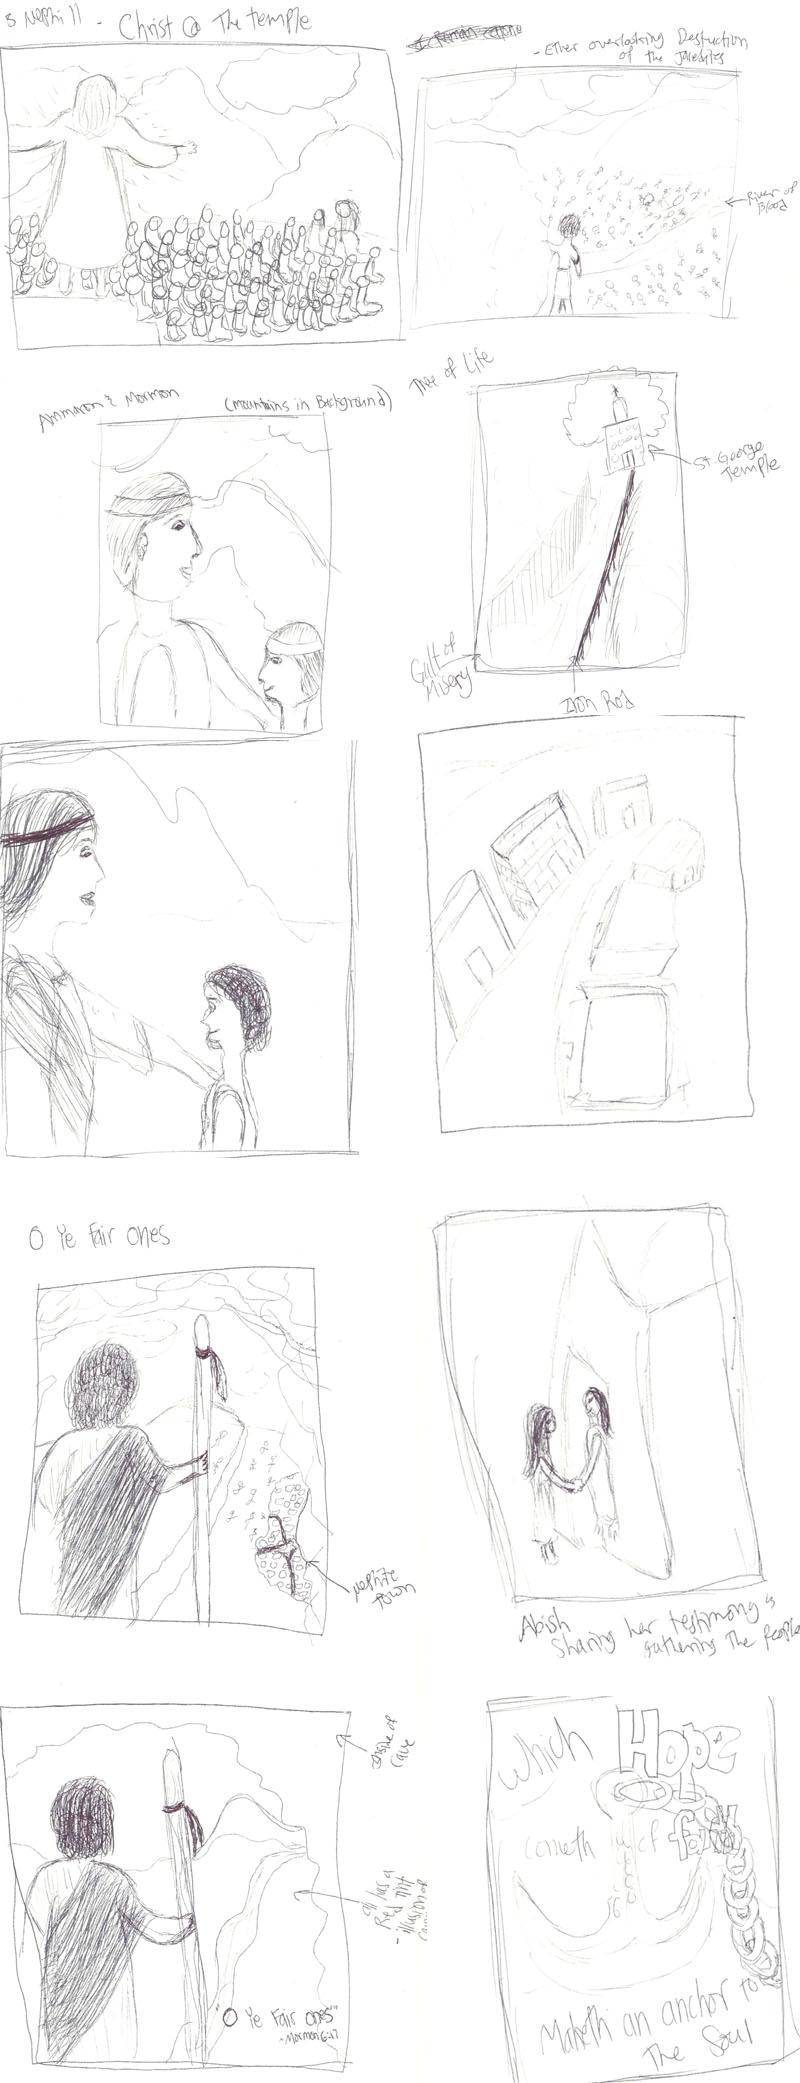 sketches_final_lharr